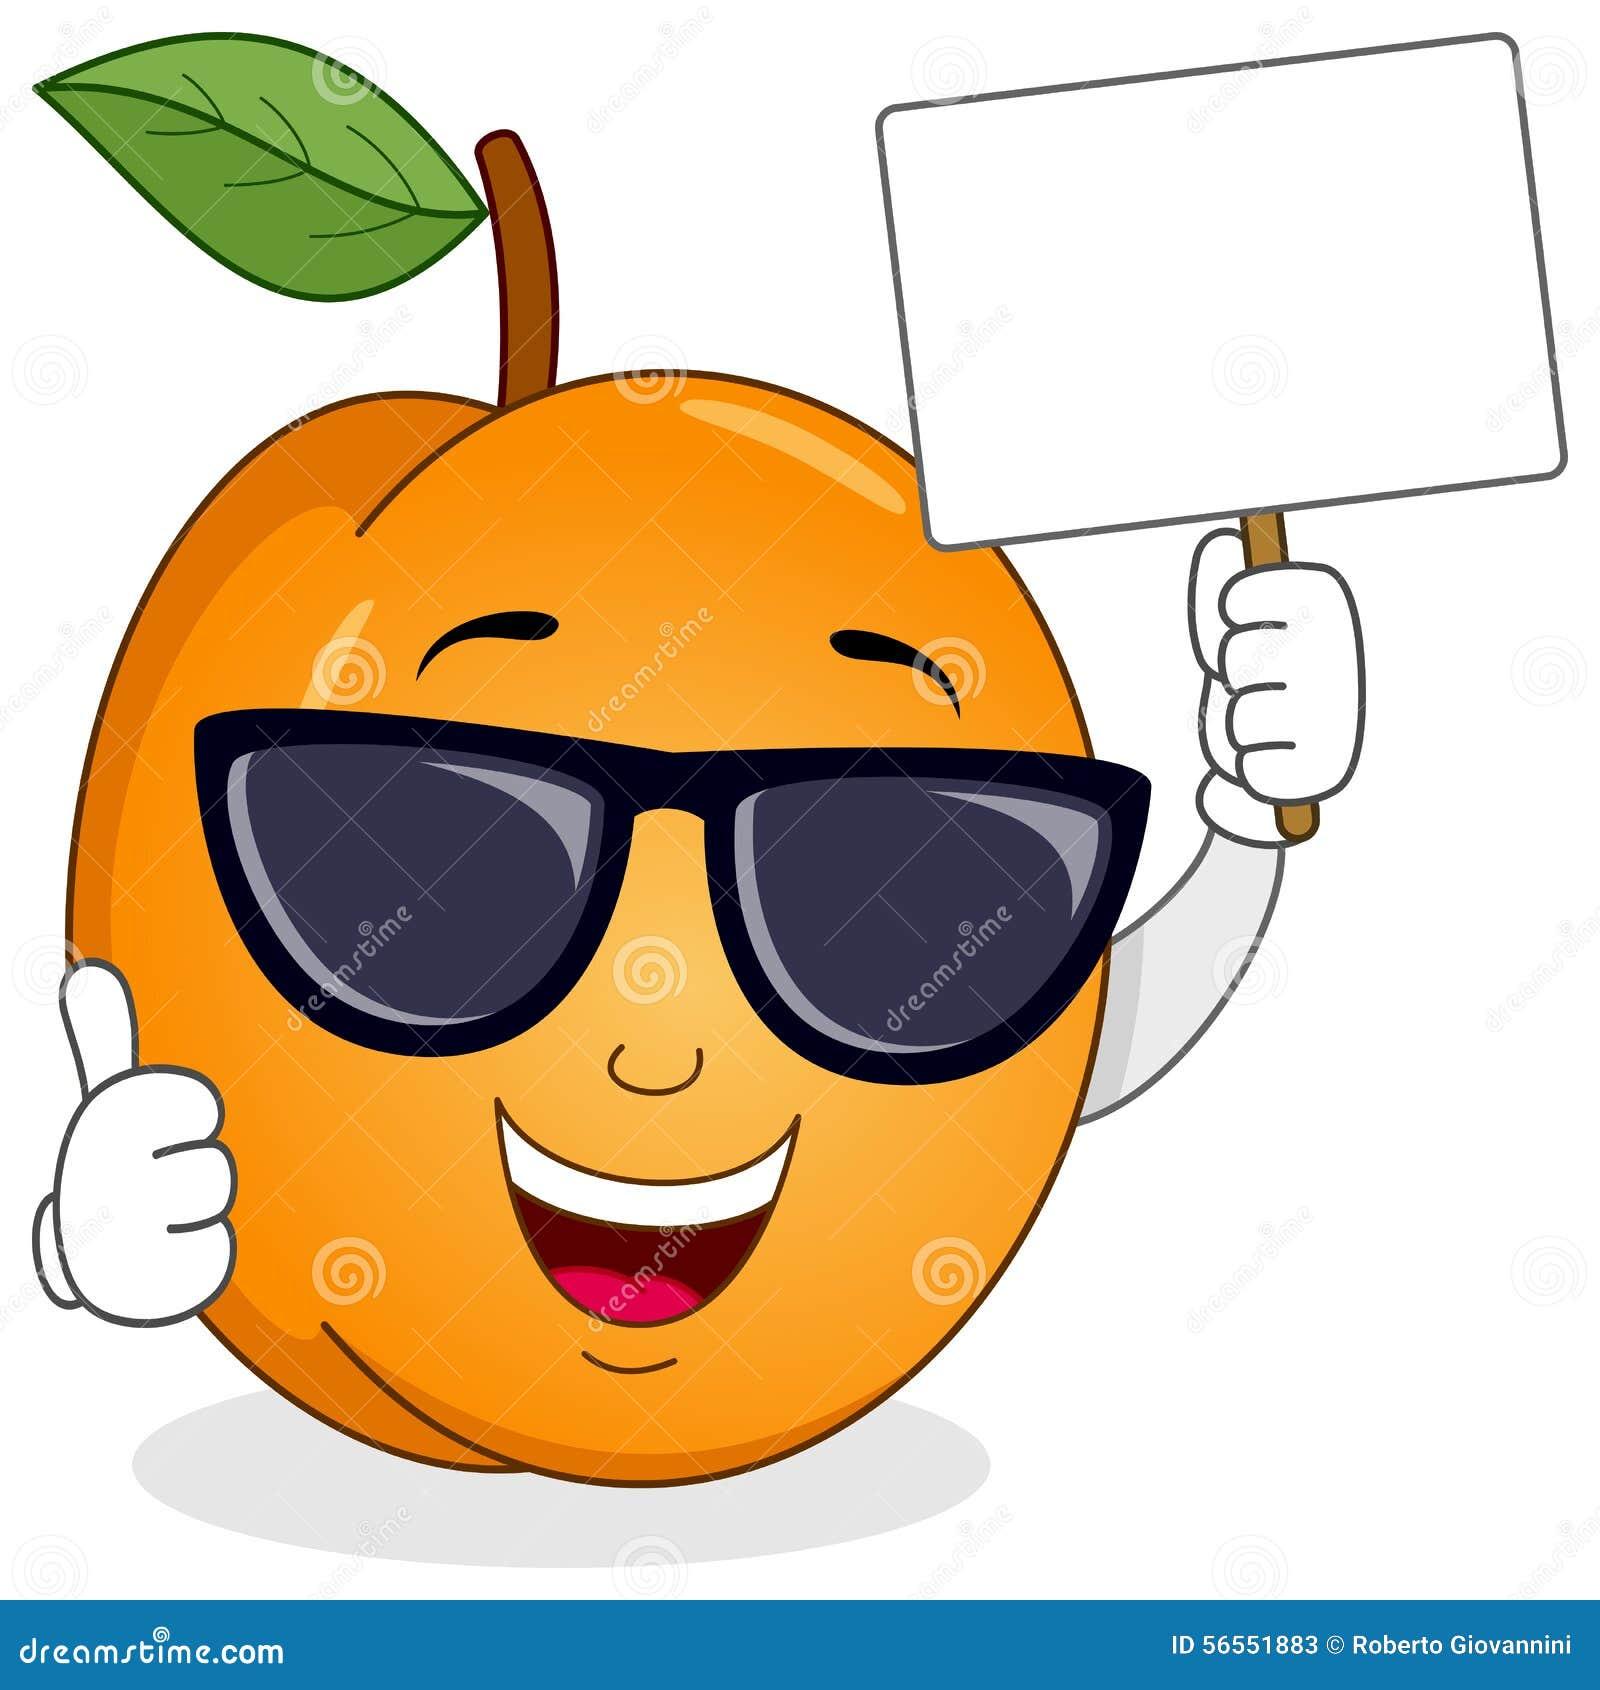 Download Βερίκοκο με τα γυαλιά ηλίου και το κενό έμβλημα Διανυσματική απεικόνιση - εικονογραφία από σχέδιο, καρπός: 56551883